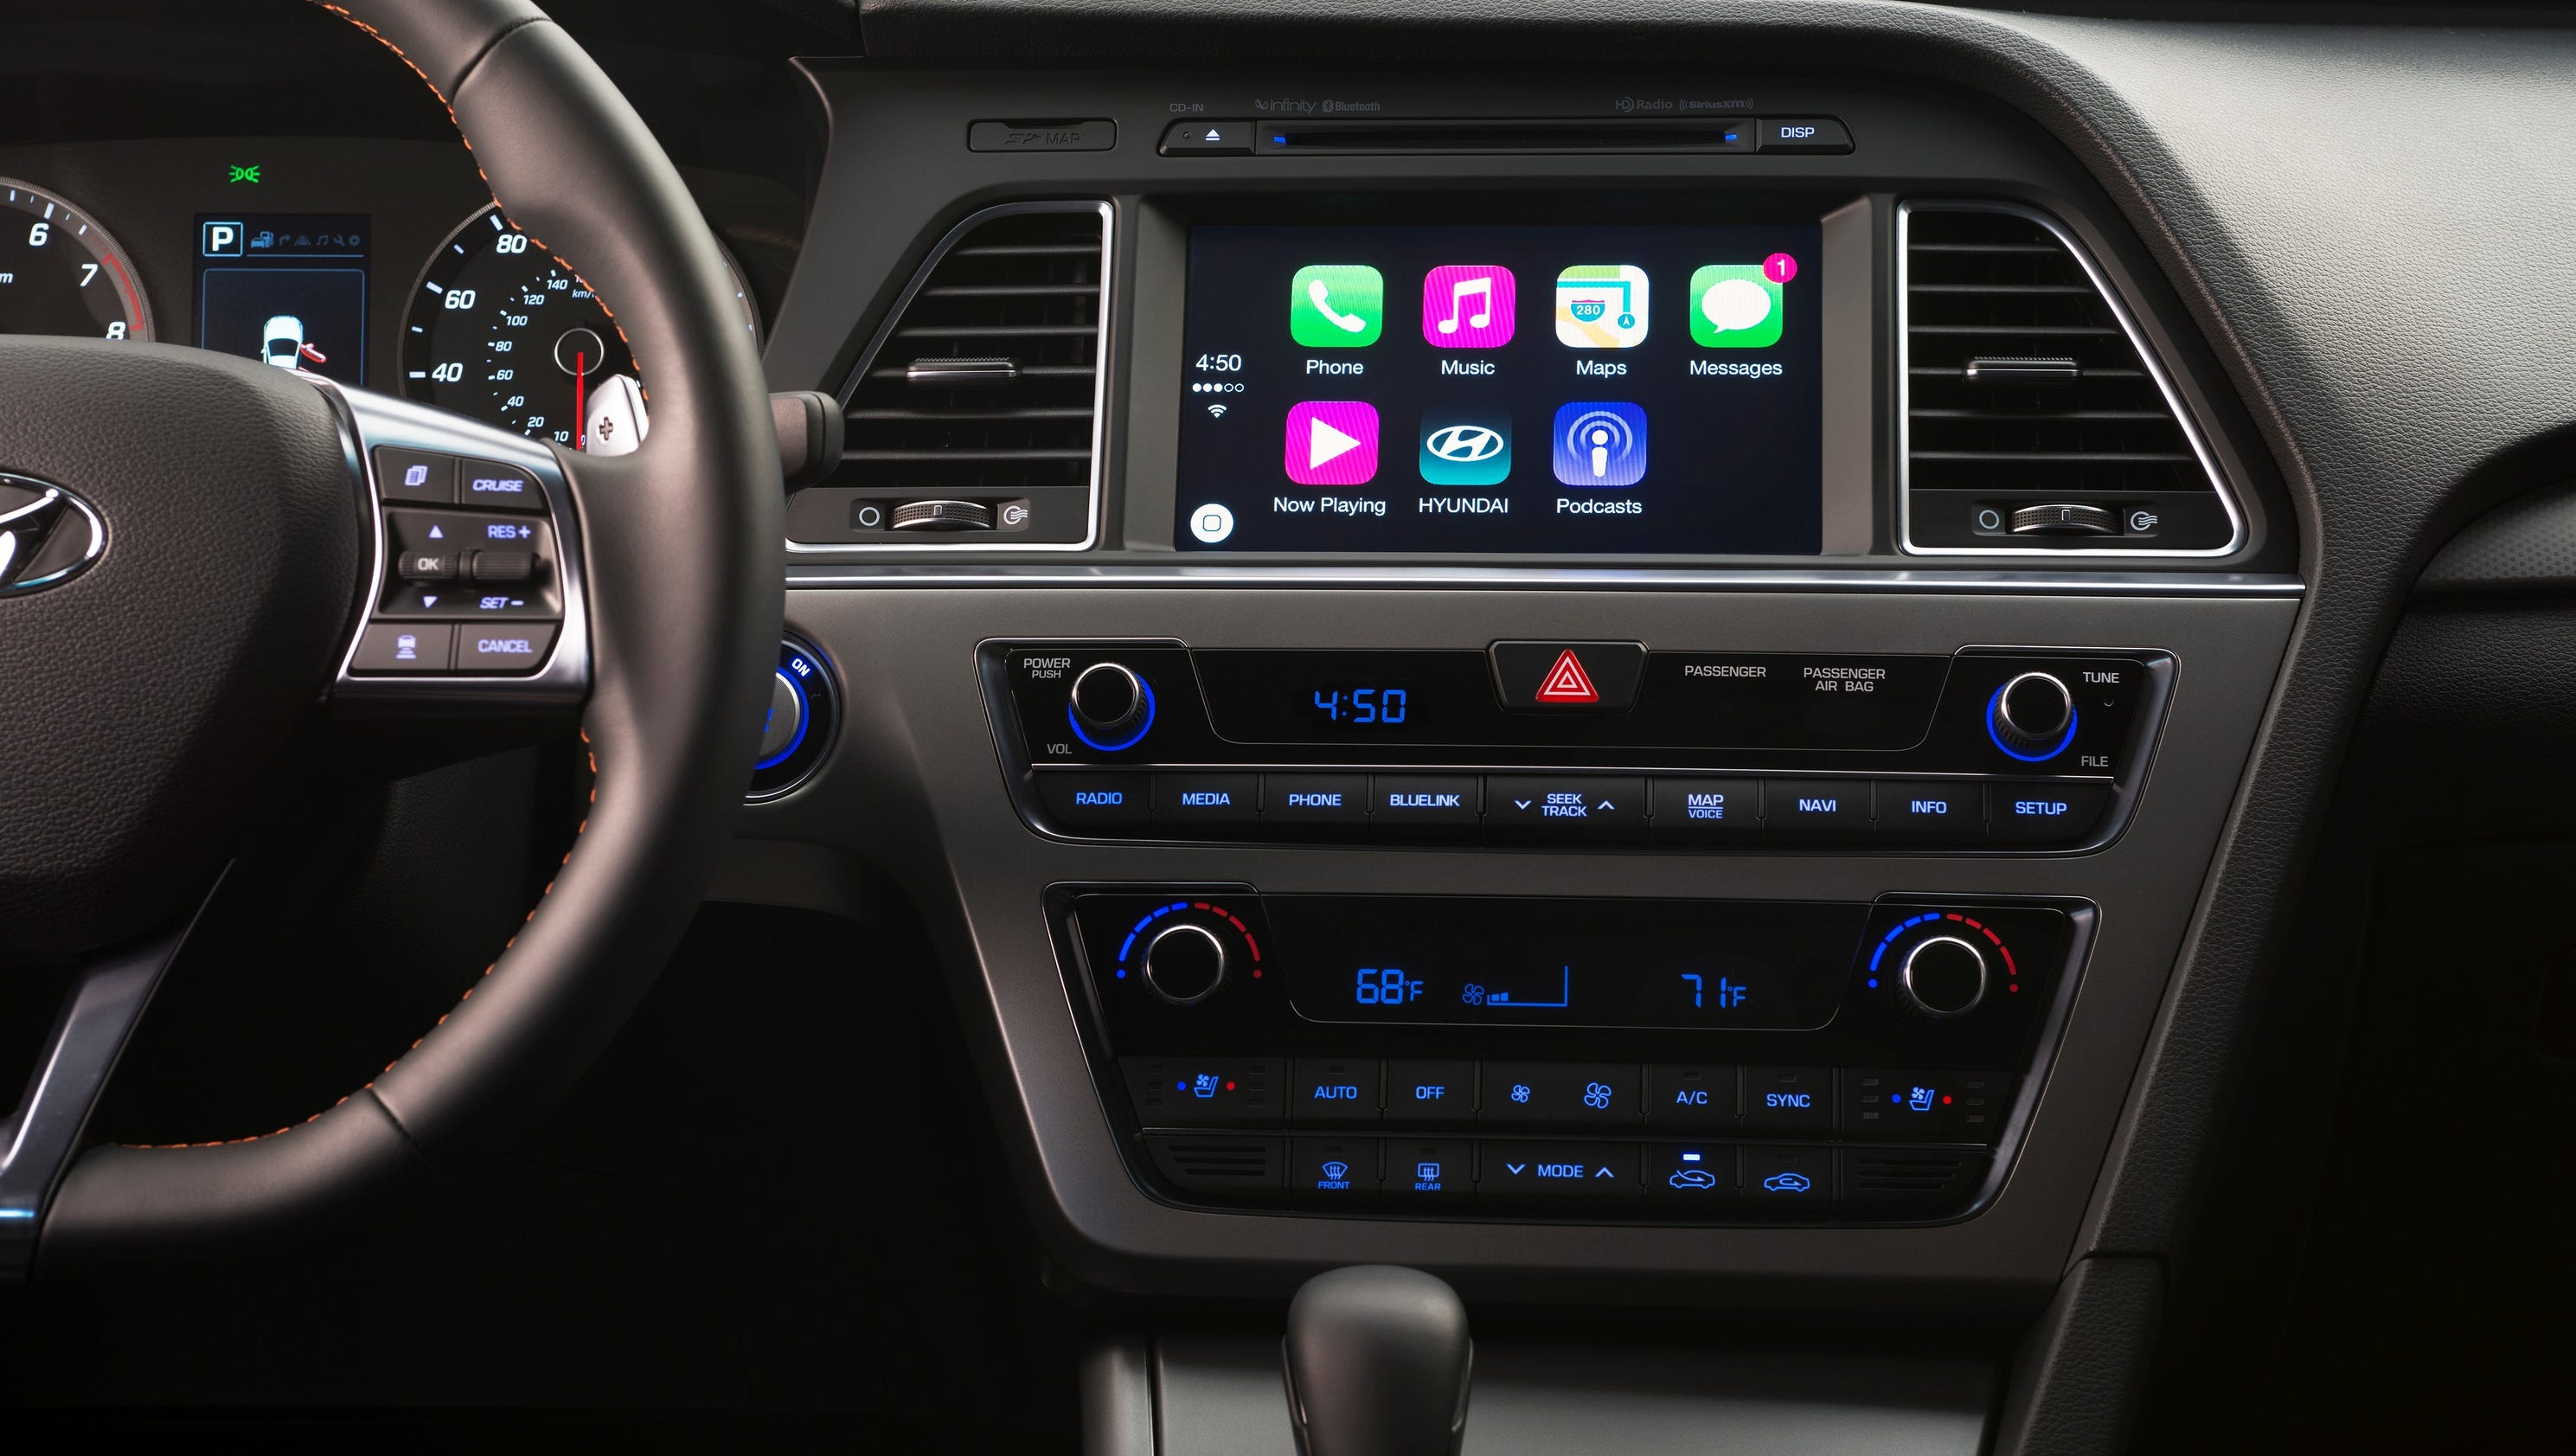 Hyundai Says 2015 Sonatas With Nav System Will Work With